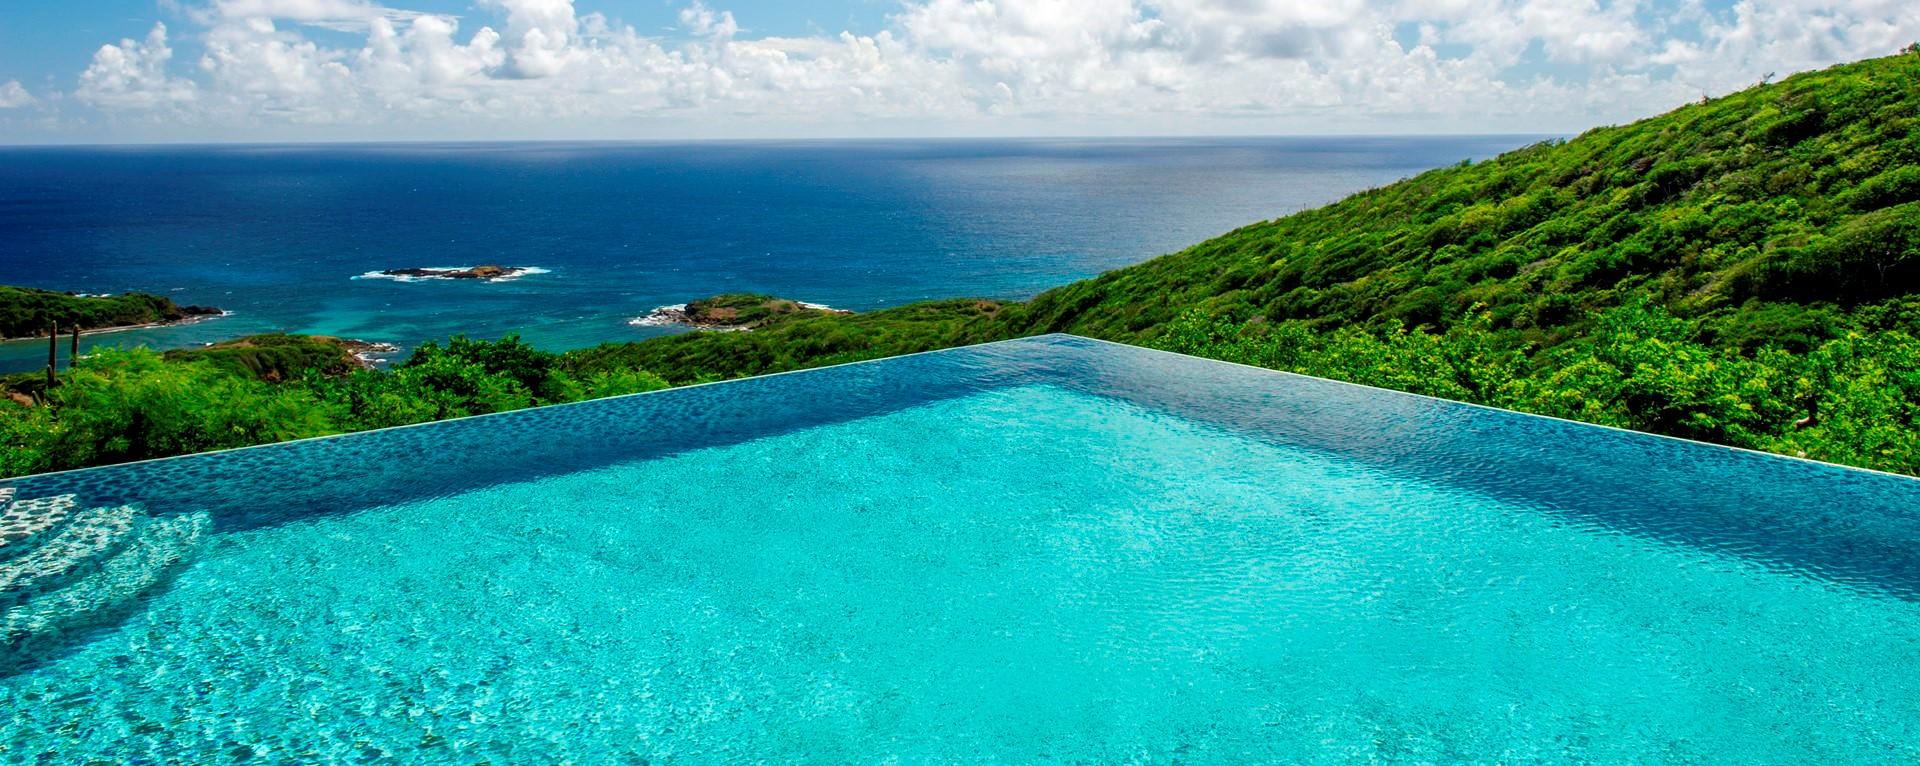 ocean-breeze-villa-mustique-pool-view